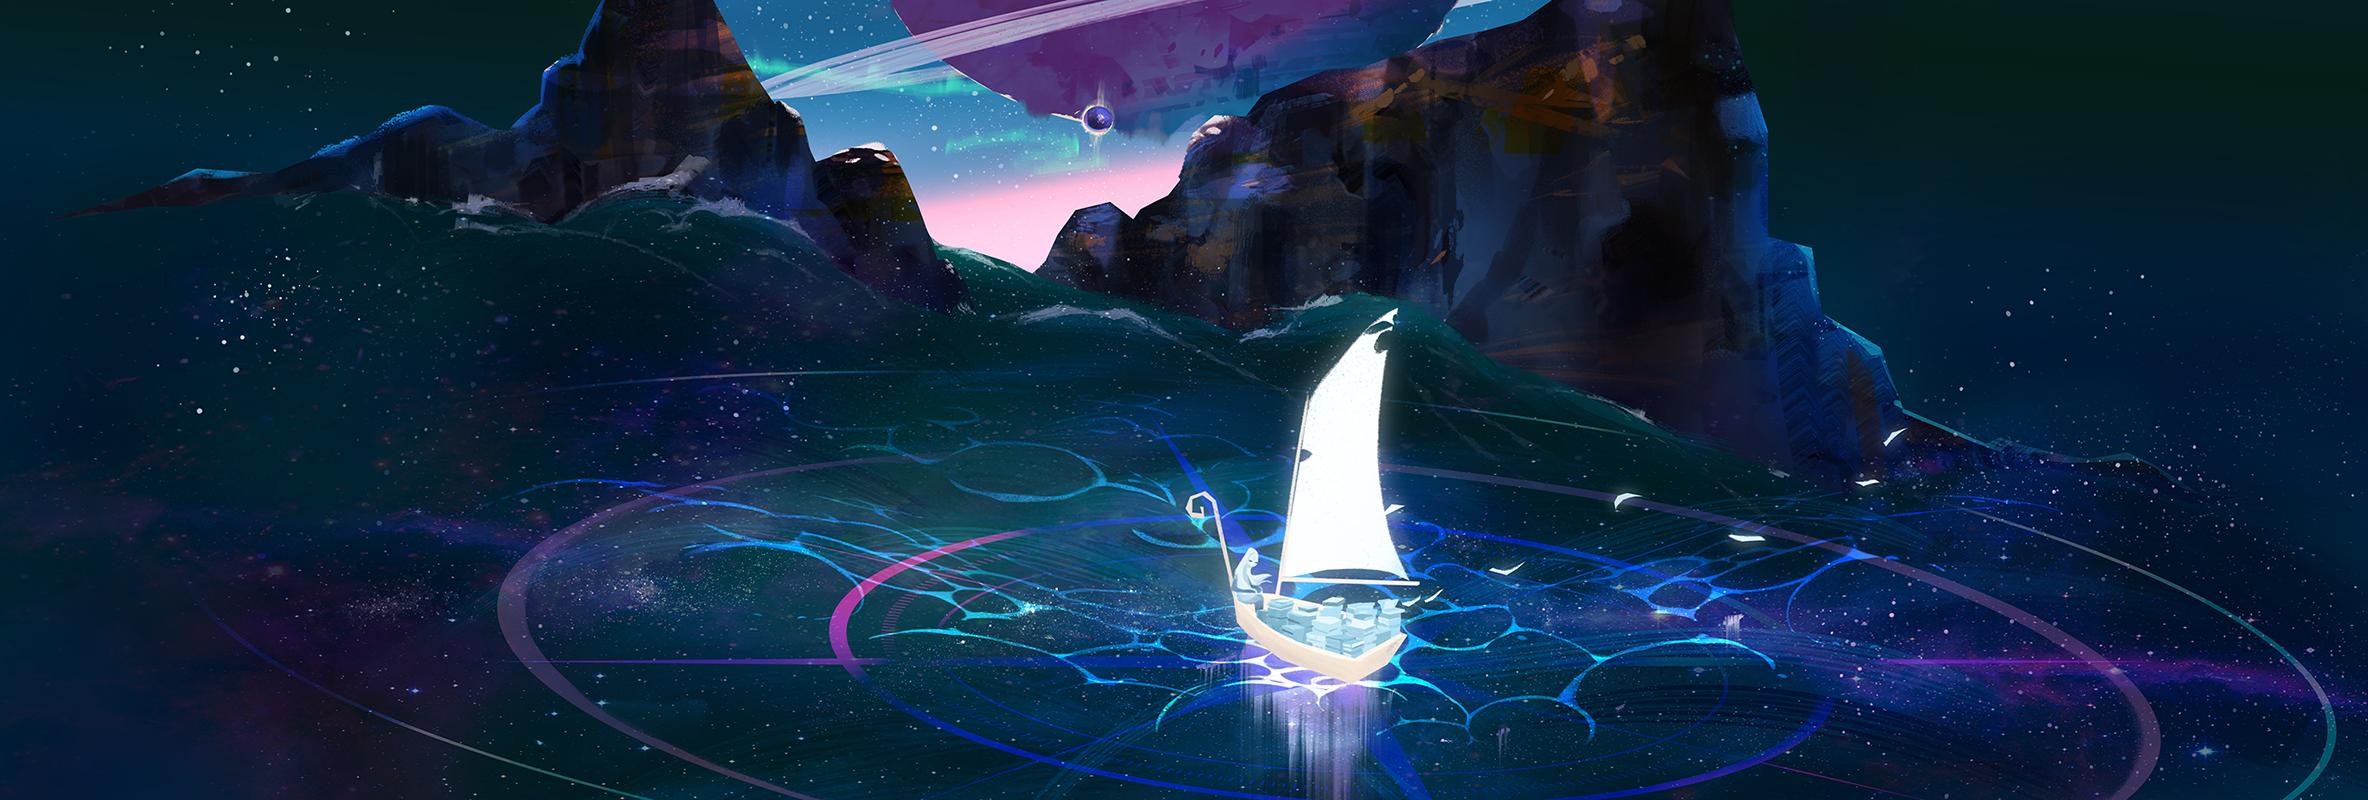 ship sailing background.jpg